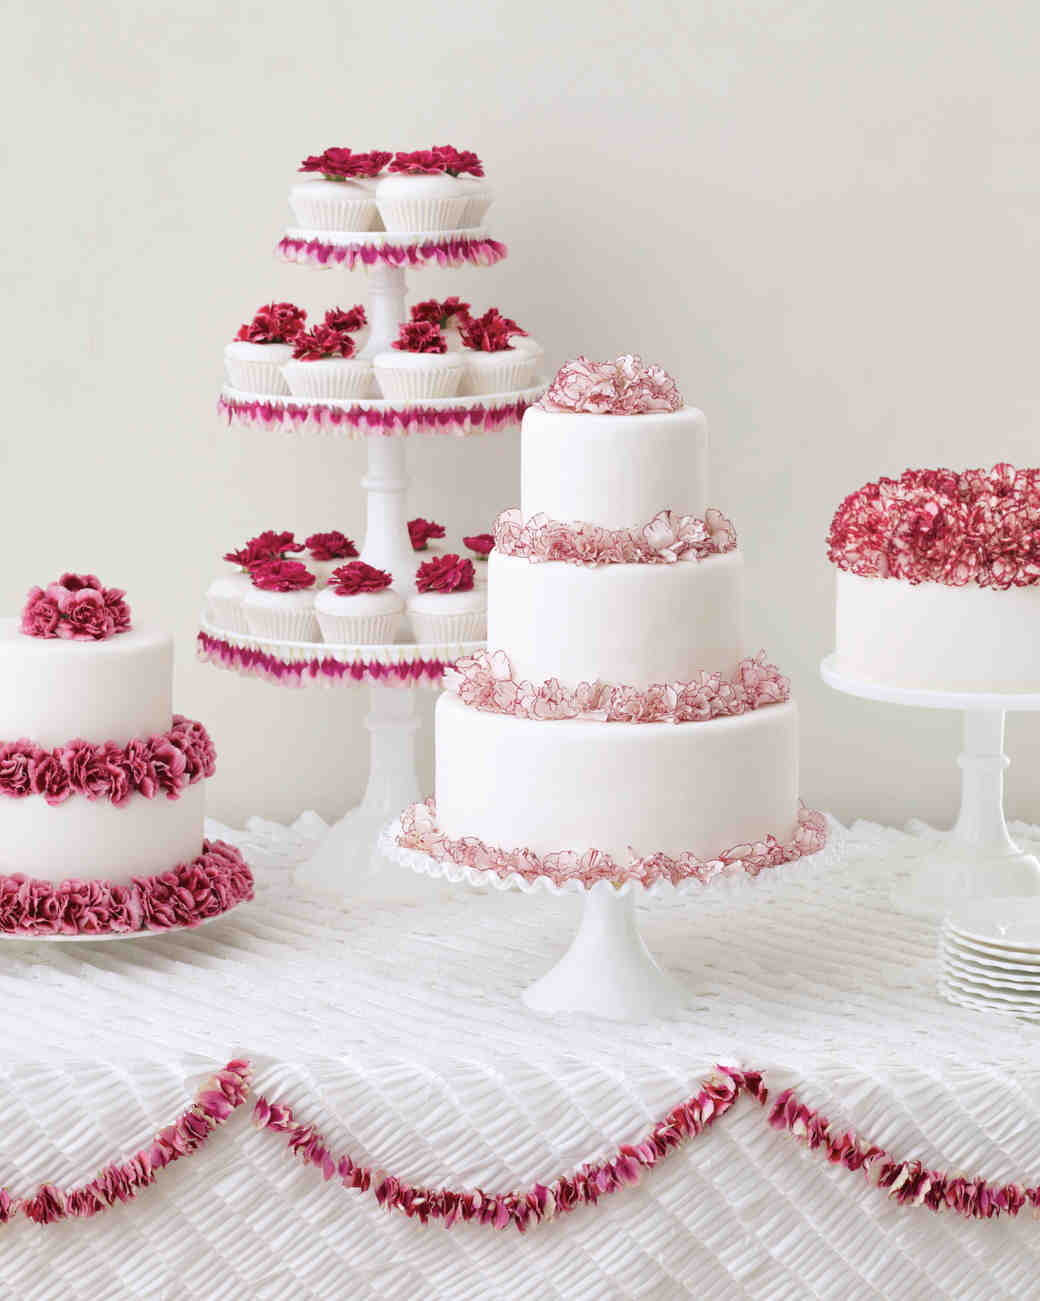 carnations-4-mwd108375.jpg